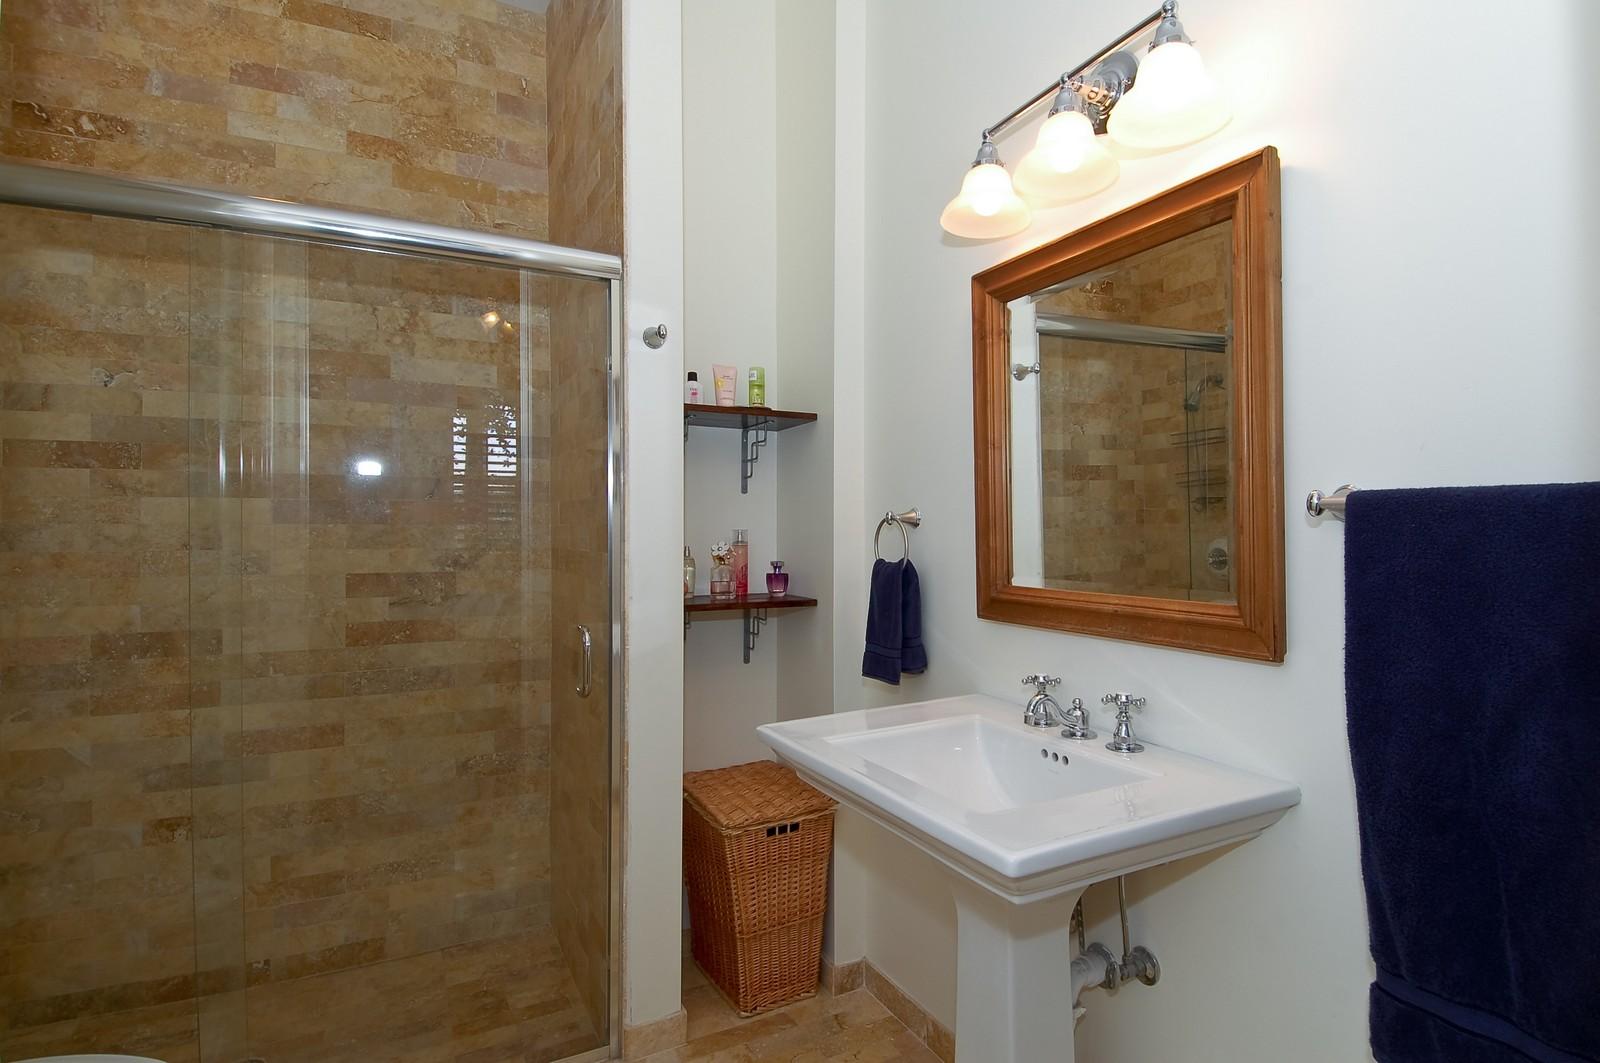 Real Estate Photography - 355 NE 3rd Ct, Boca Raton, FL, 33432 - 2nd Bathroom